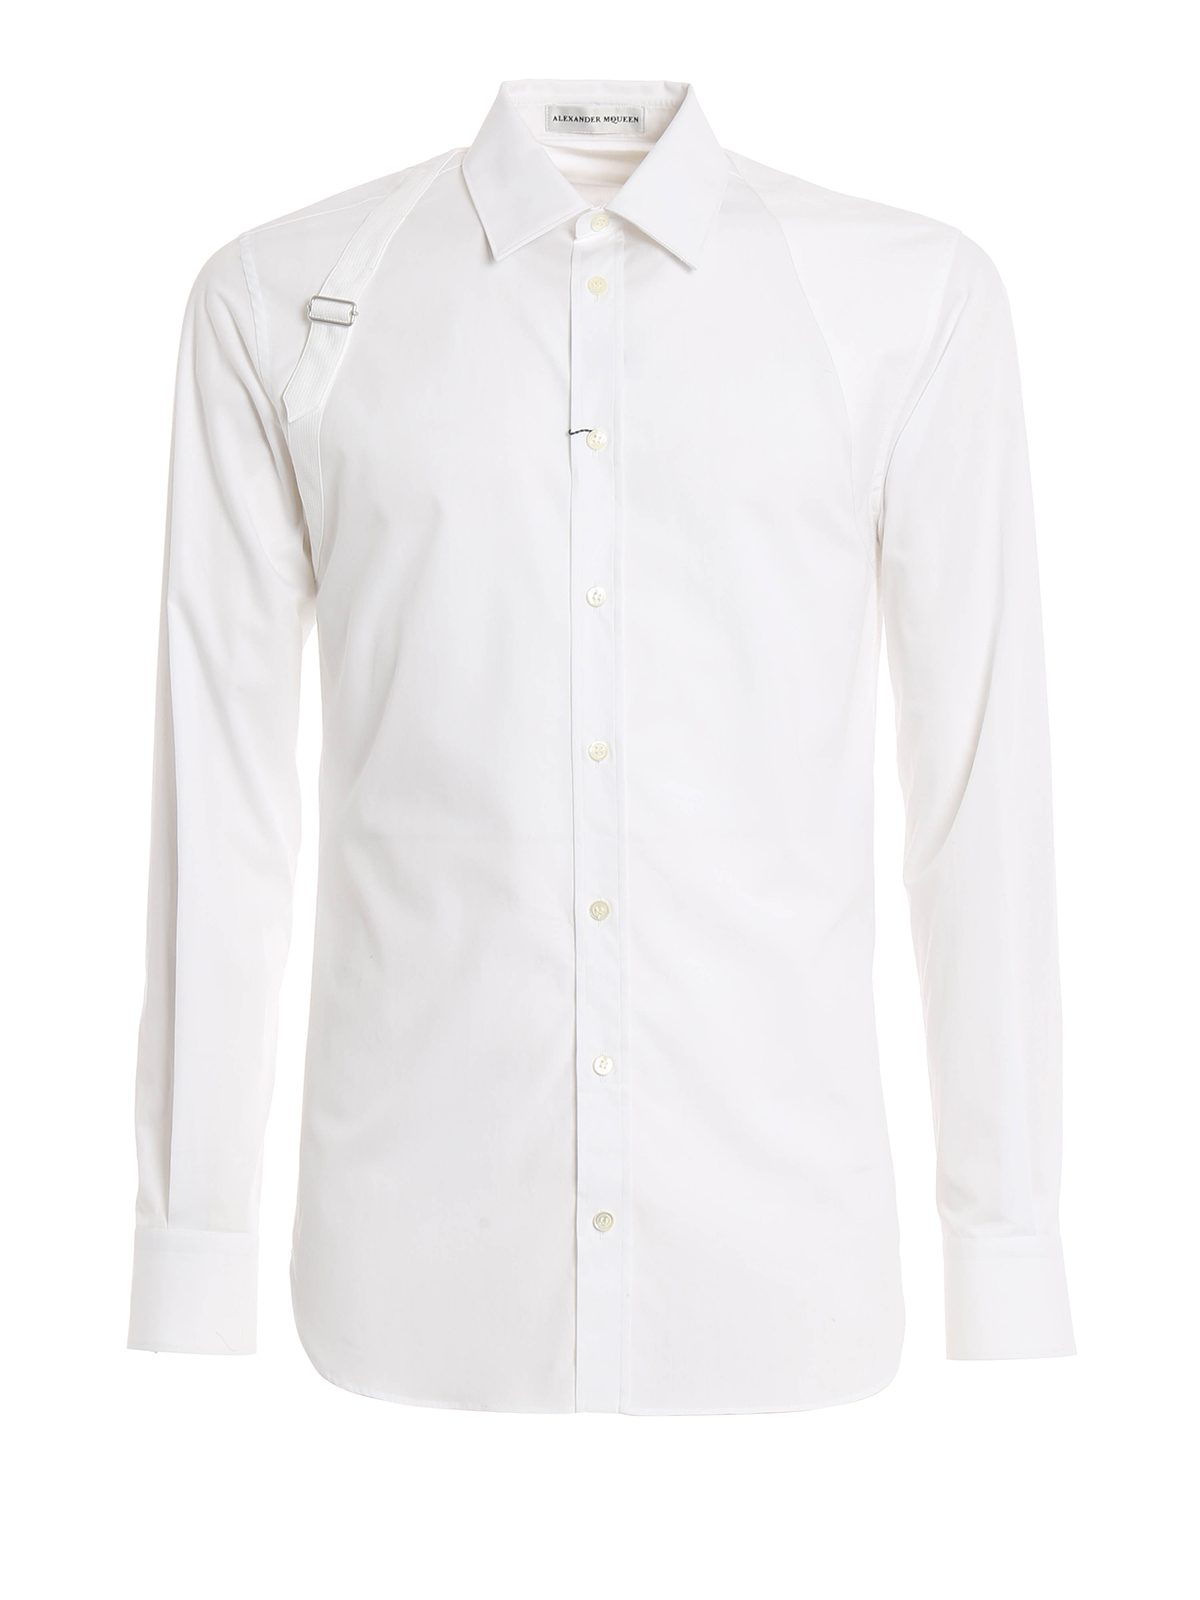 Harness detailed shirt by alexander mcqueen shirts ikrix for Alexander mcqueen shirt men